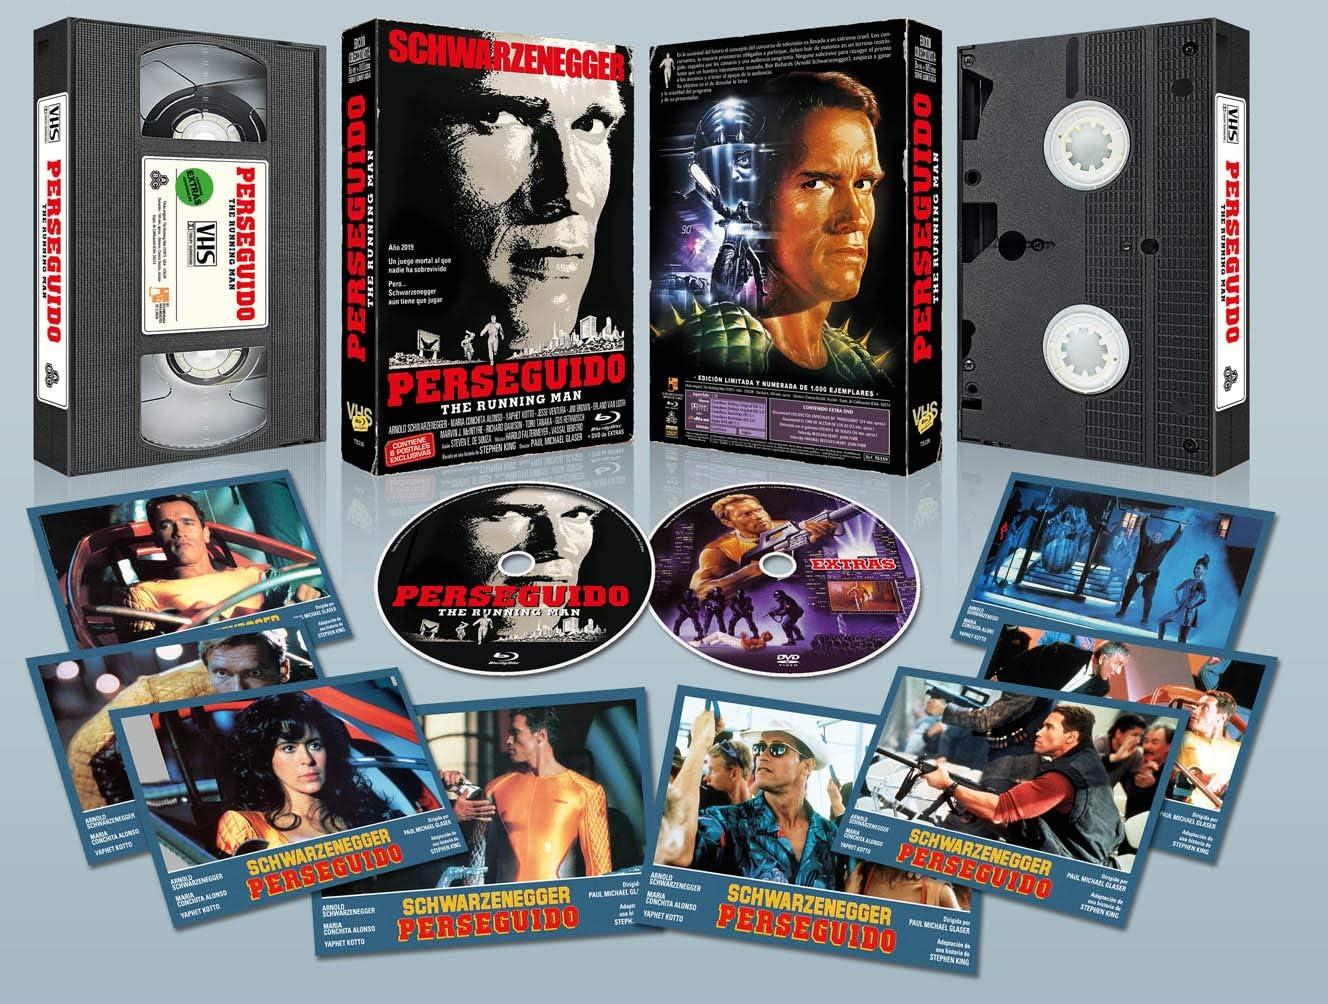 Tu peli favorita de Arnold Schwarzenegger - Página 5 714IdmZ1IML._AC_SL1500_